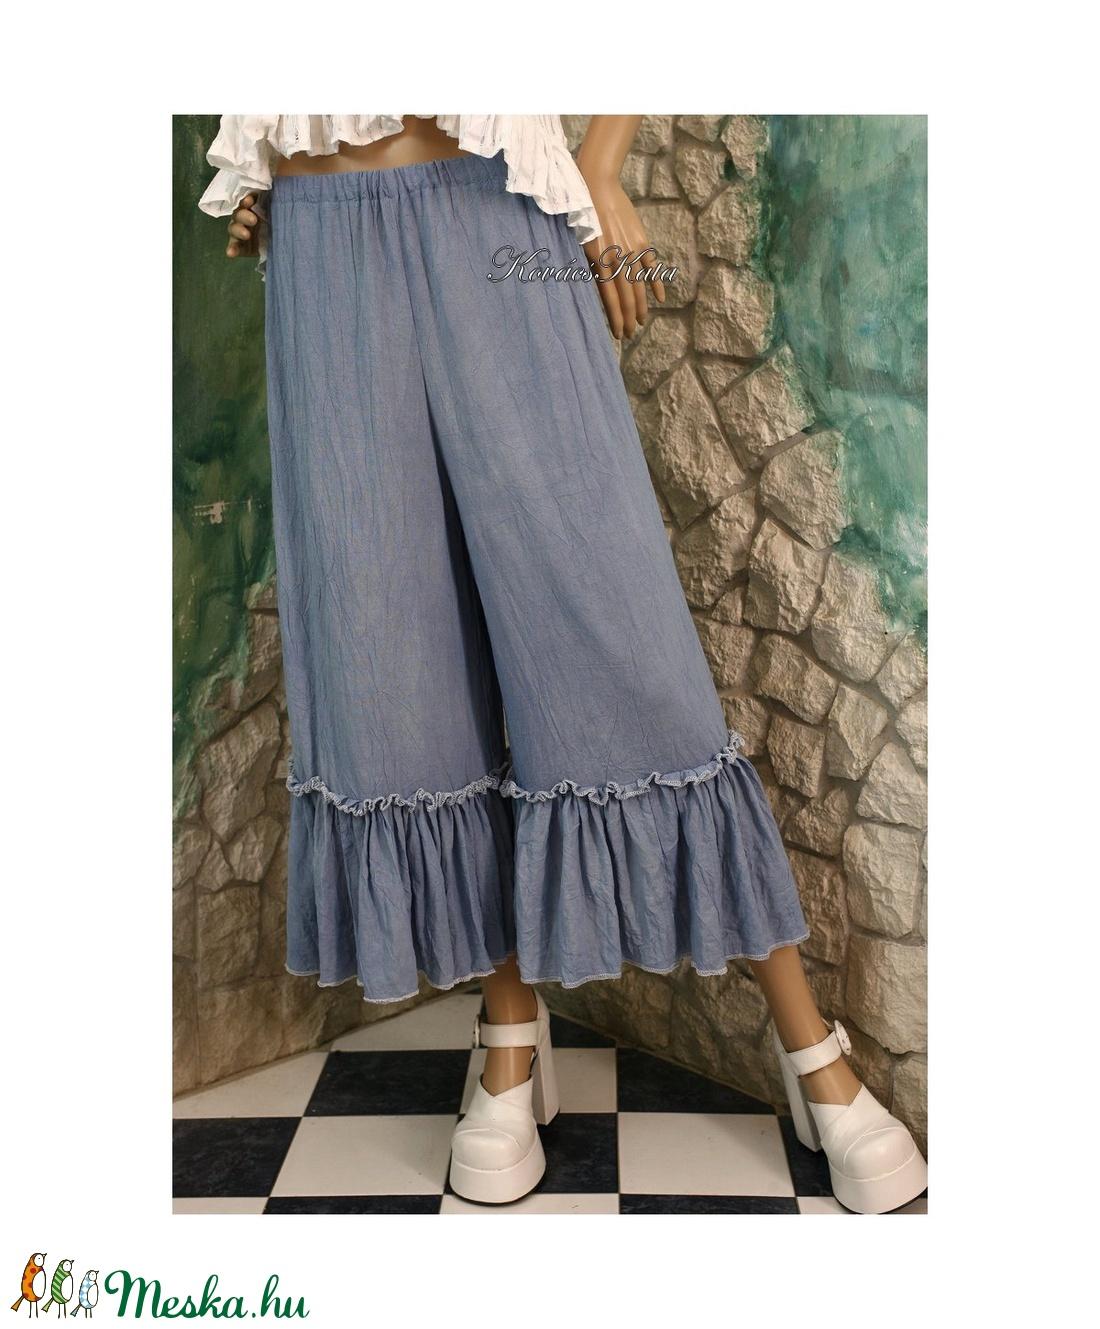 TARANTELLA - romantikus design nadrág  - ruha & divat - női ruha - nadrág - Meska.hu